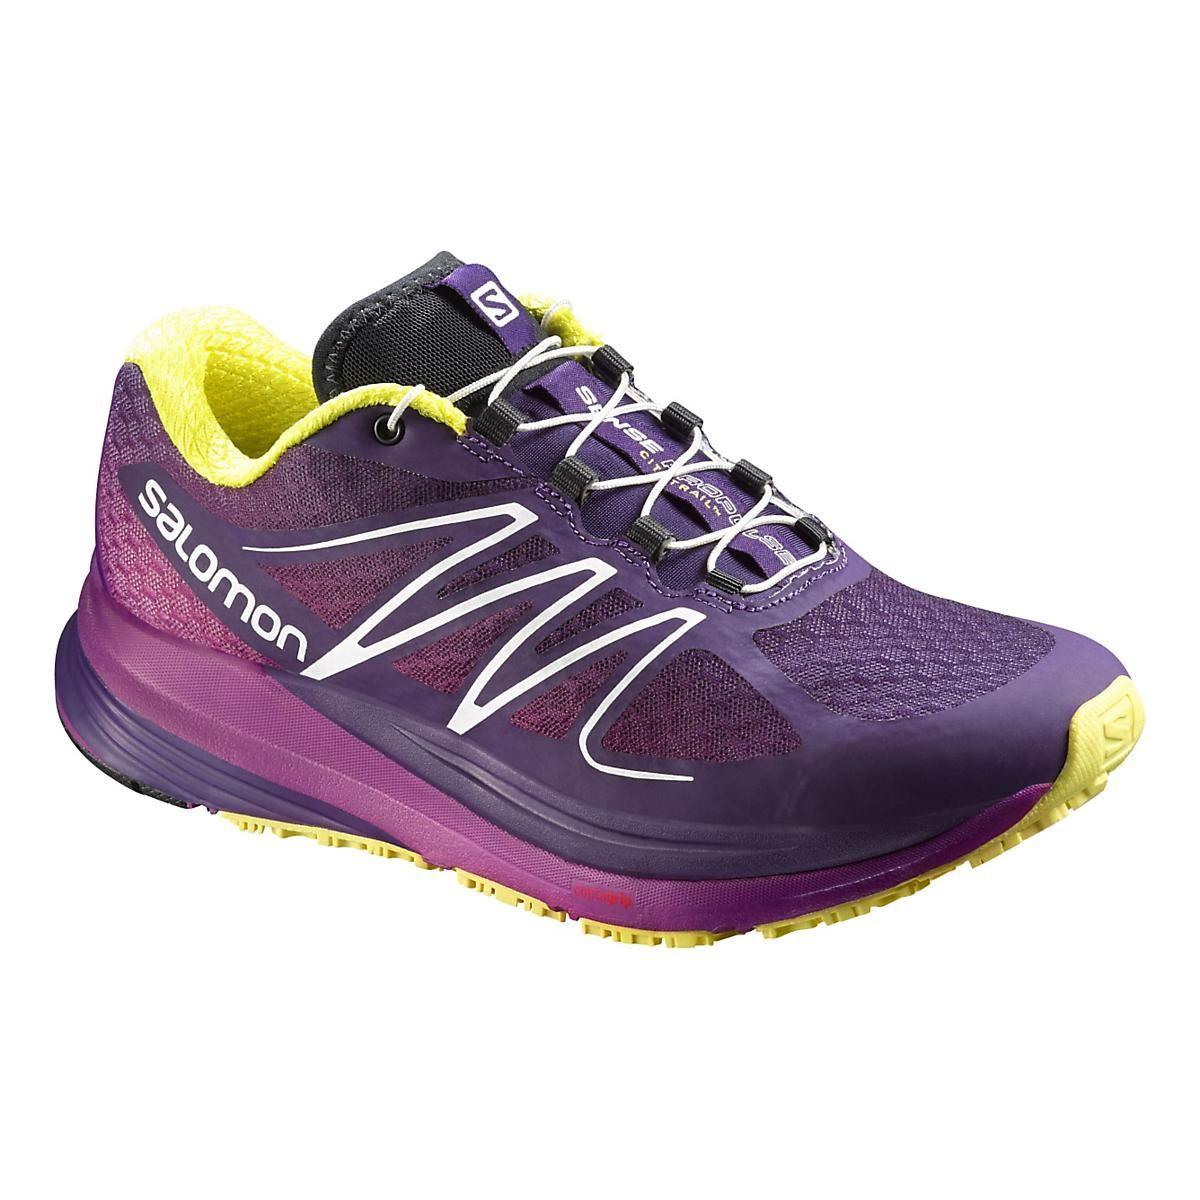 Sense Propulse | Salomon trail running shoes, Trail running